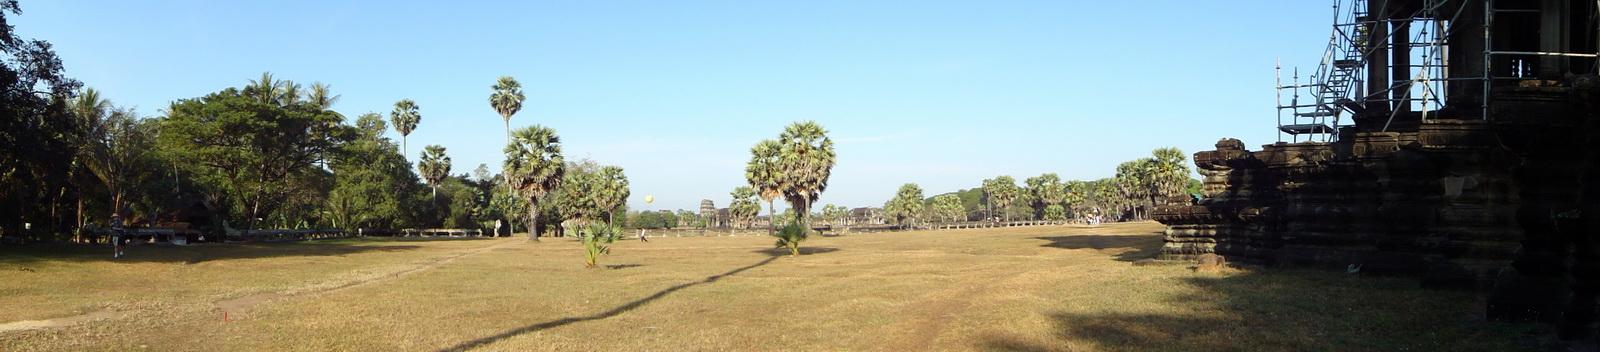 Angkor Wat panoramic view S side looking west Angkor Siem Reap 01